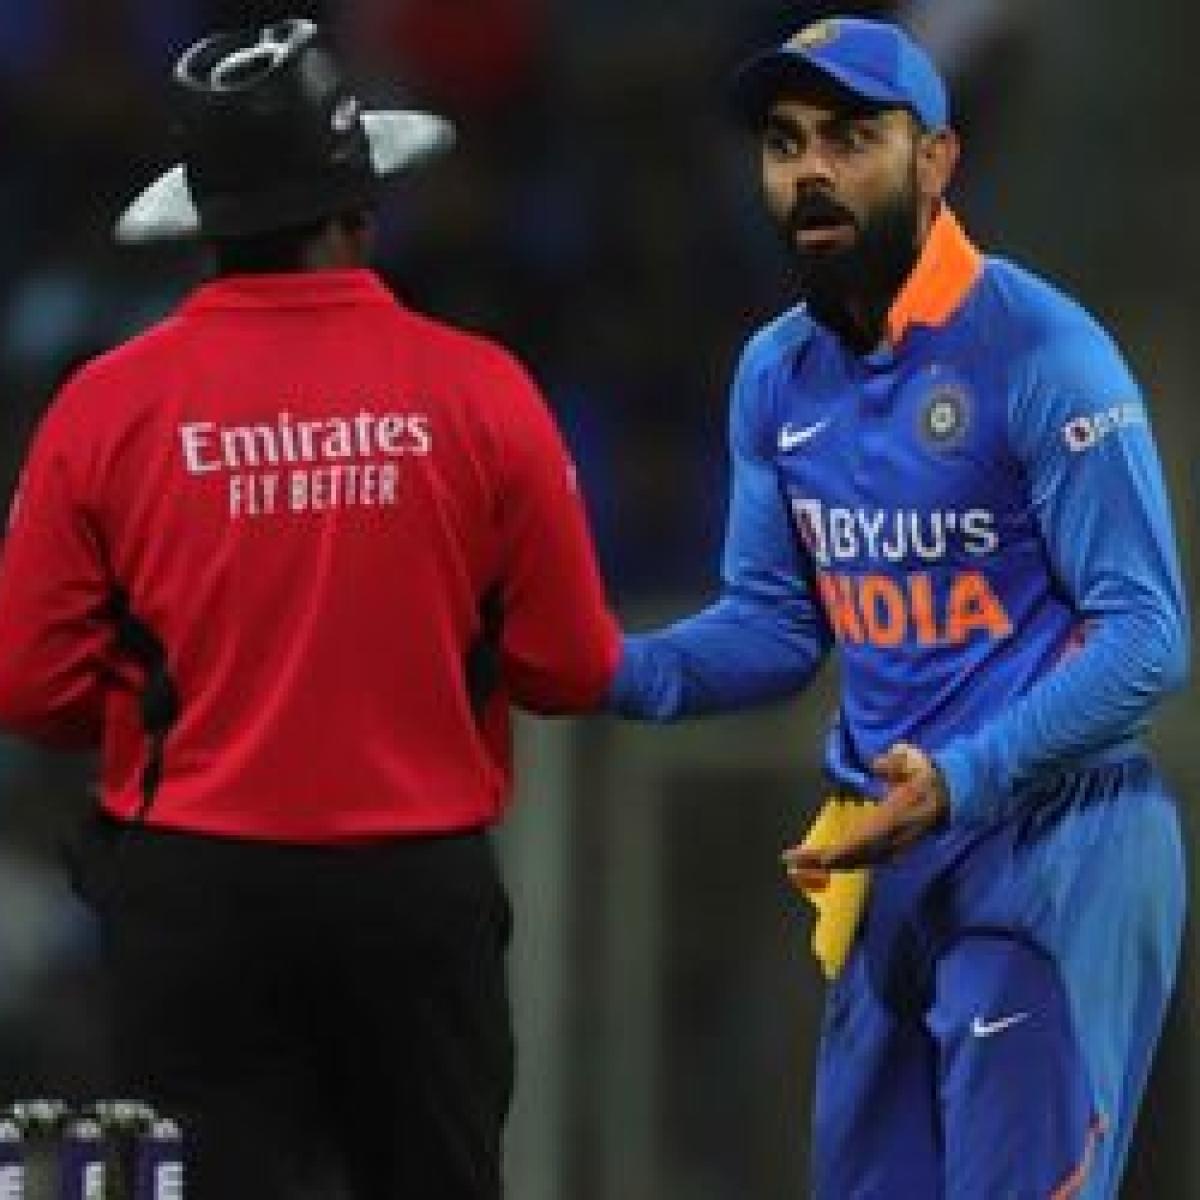 'Sri Lankans airport pe hi hai, wapas bulaye?': Twitter trolls India after staggering defeat to Australia in 1st ODI